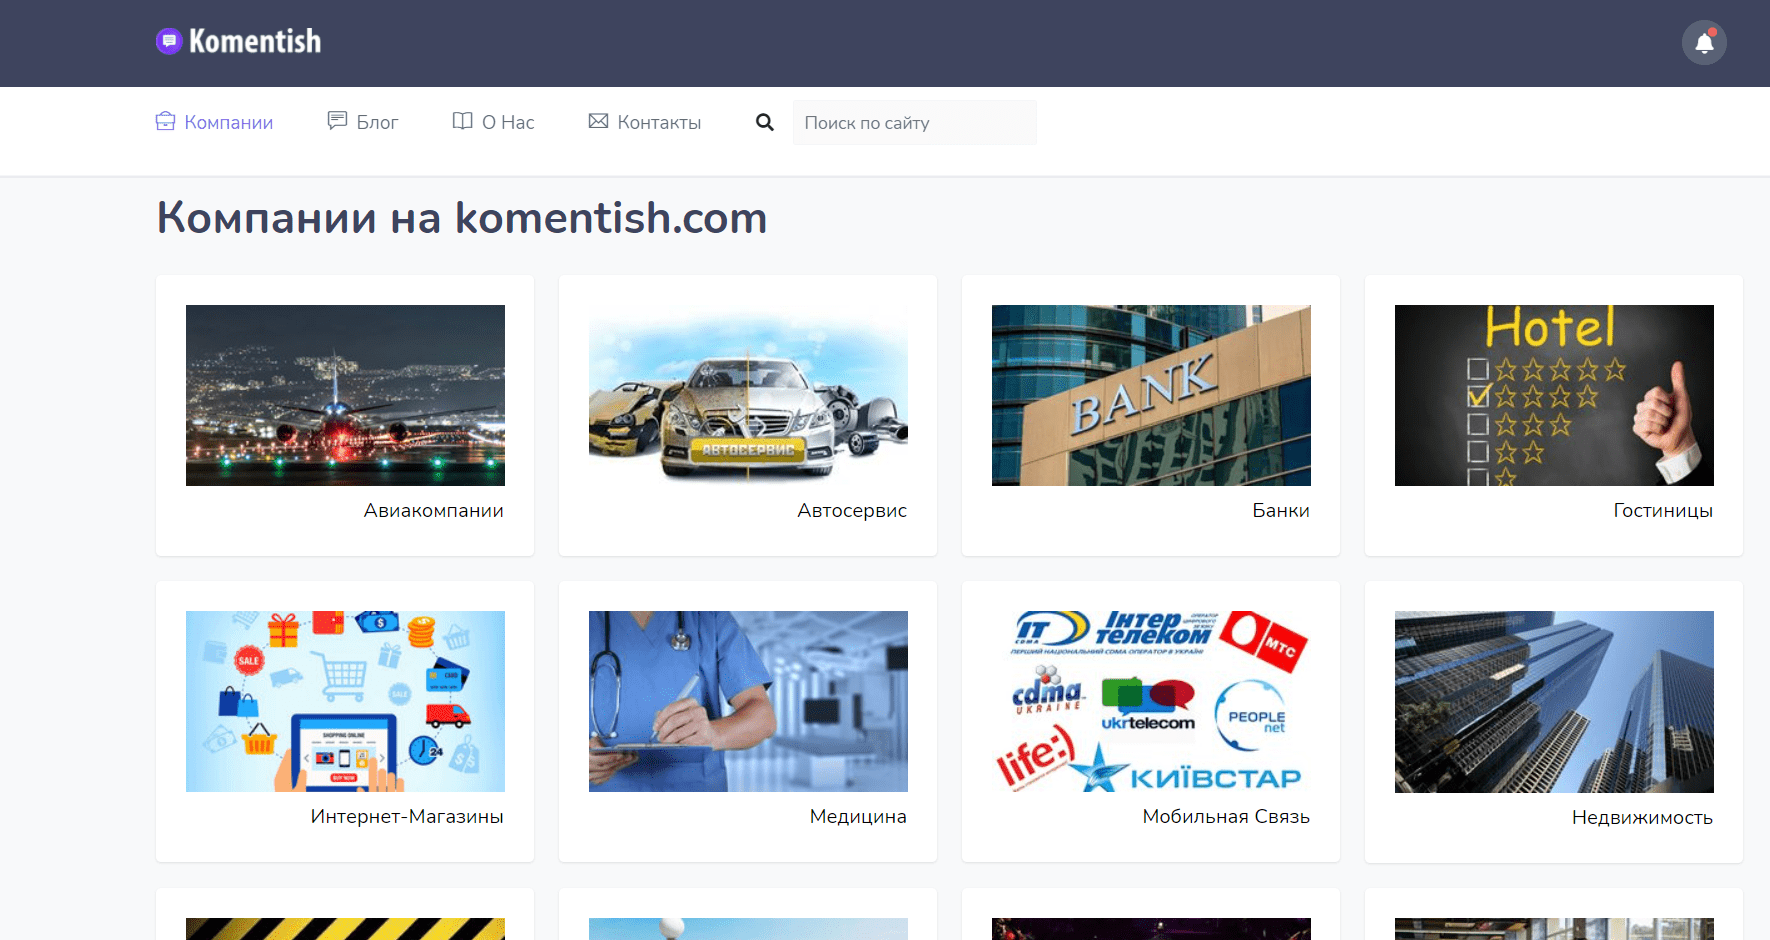 komentish.com